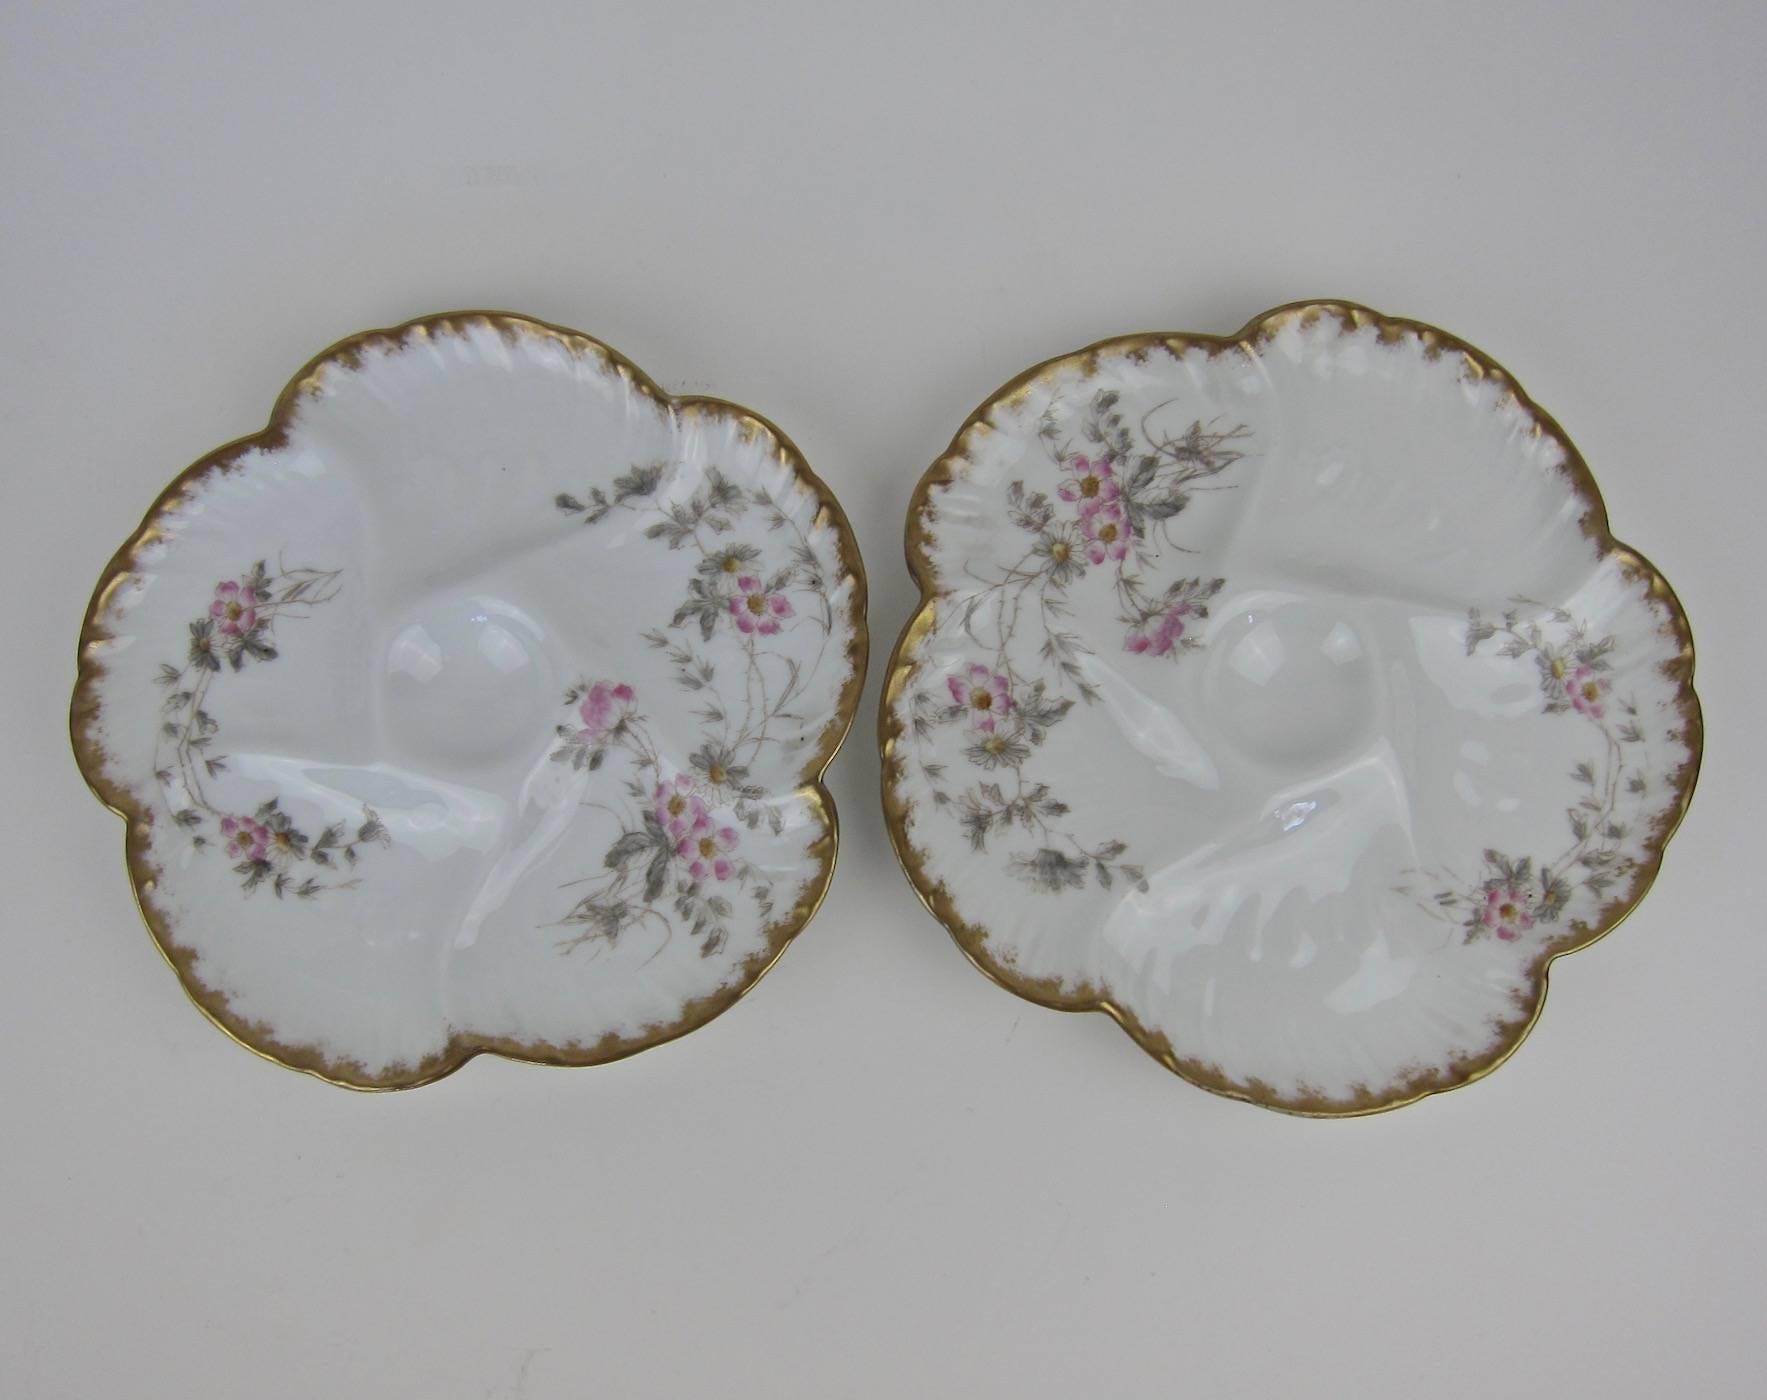 Antique Gerard Dufraisseix and Morel Limoges Porcelain Oyster Plates CFH / GDM For Sale at 1stdibs & Antique Gerard Dufraisseix and Morel Limoges Porcelain Oyster Plates ...